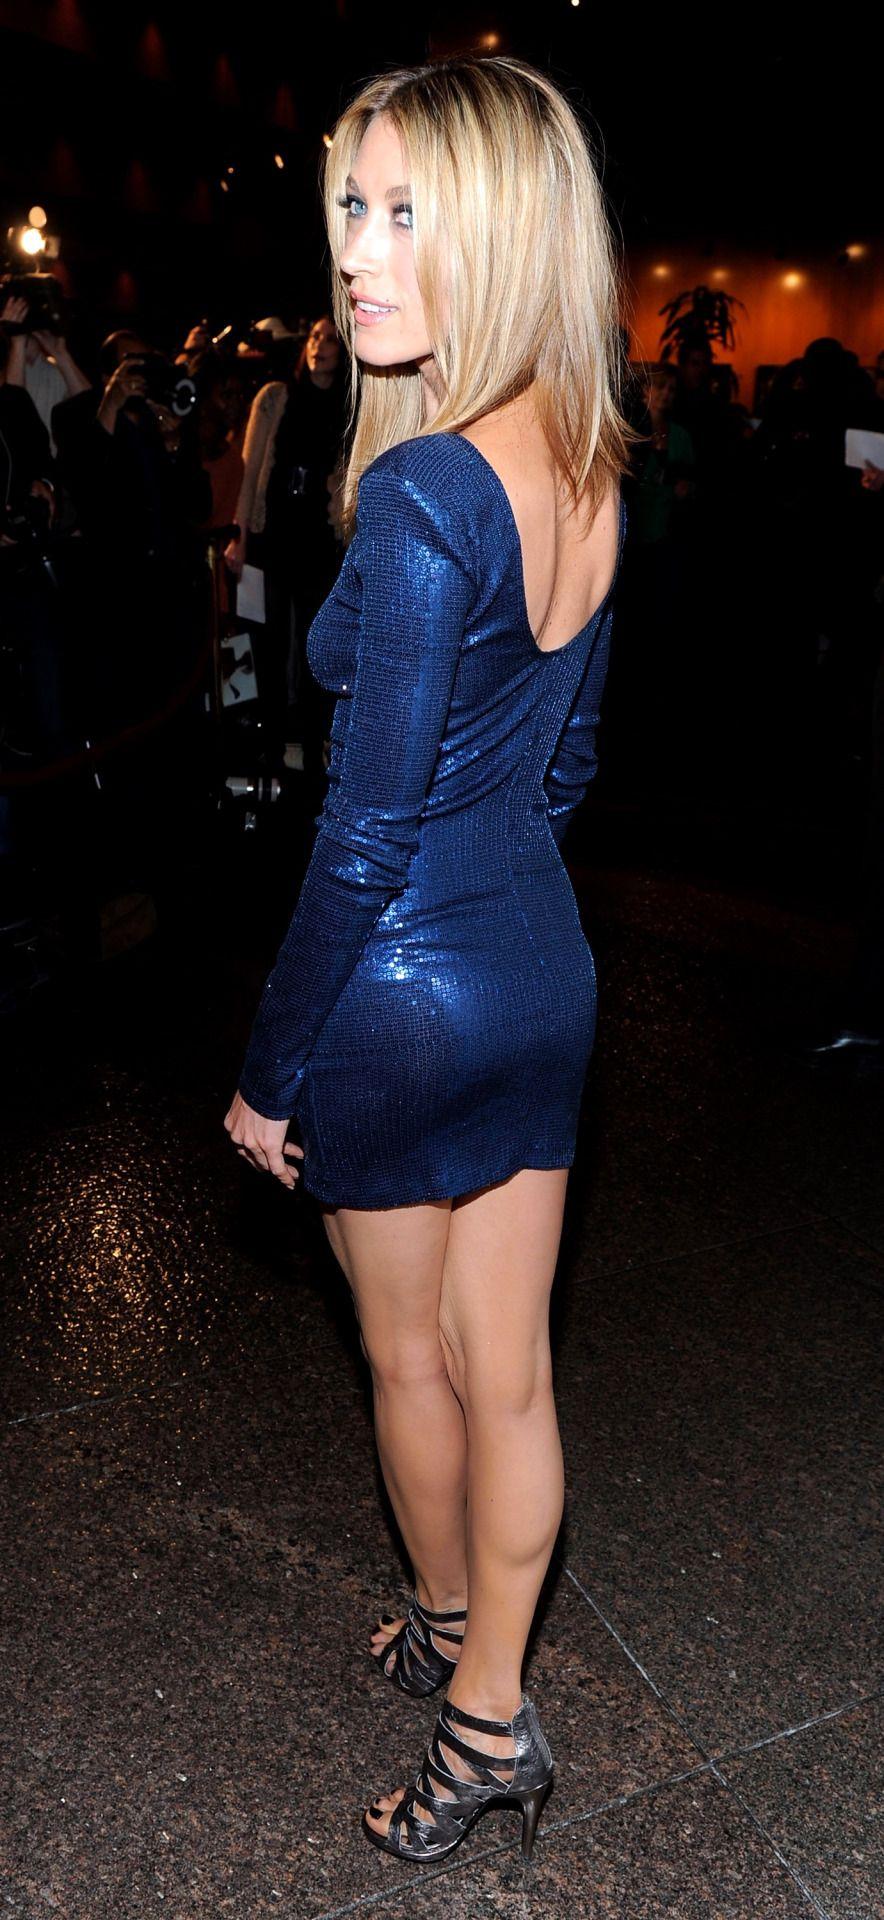 Maisie williams booty new foto